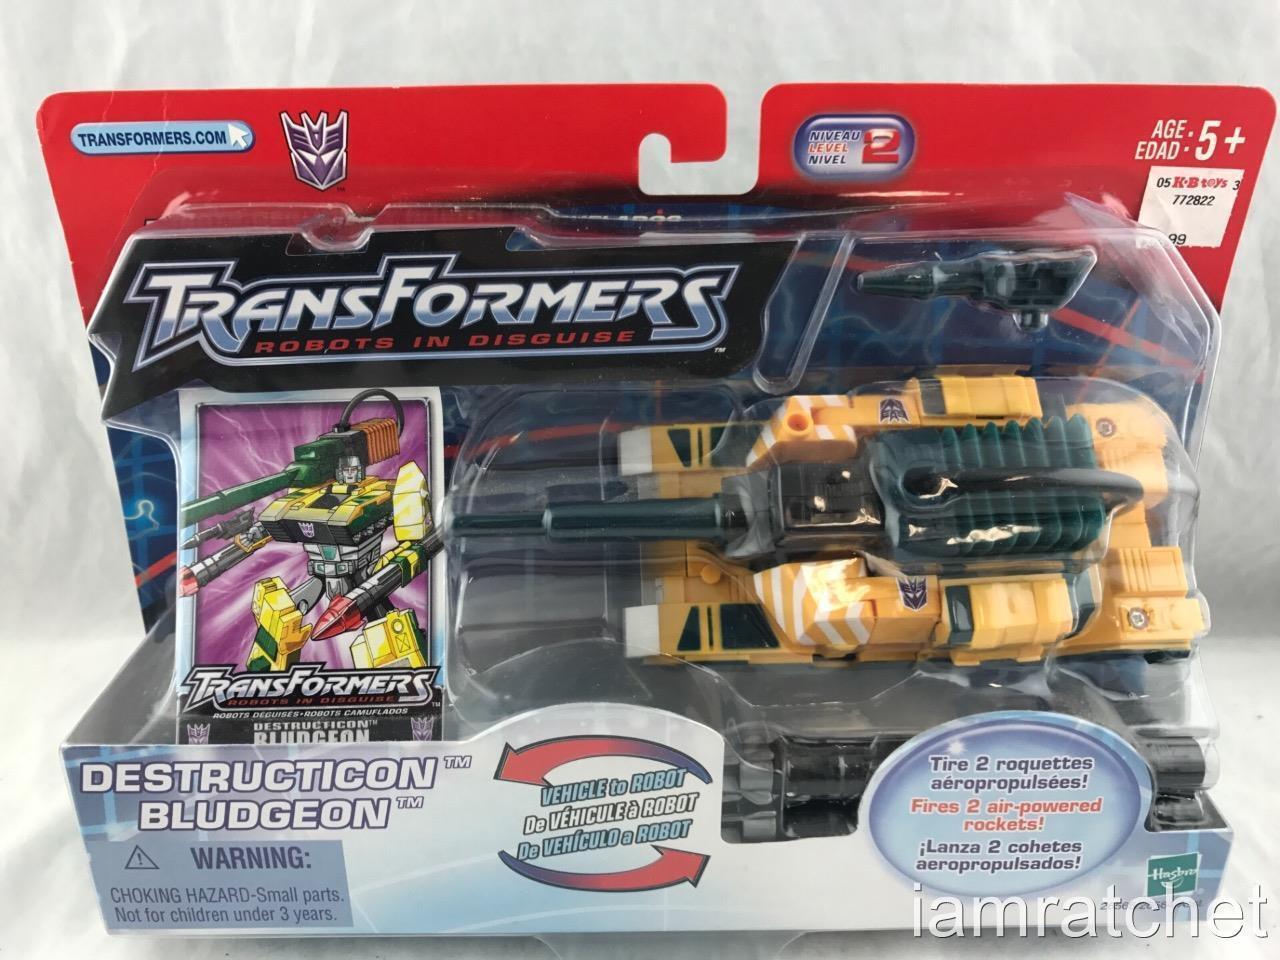 Transformers Original RID Robots in Disguise Destruction bluedgeon MOSC